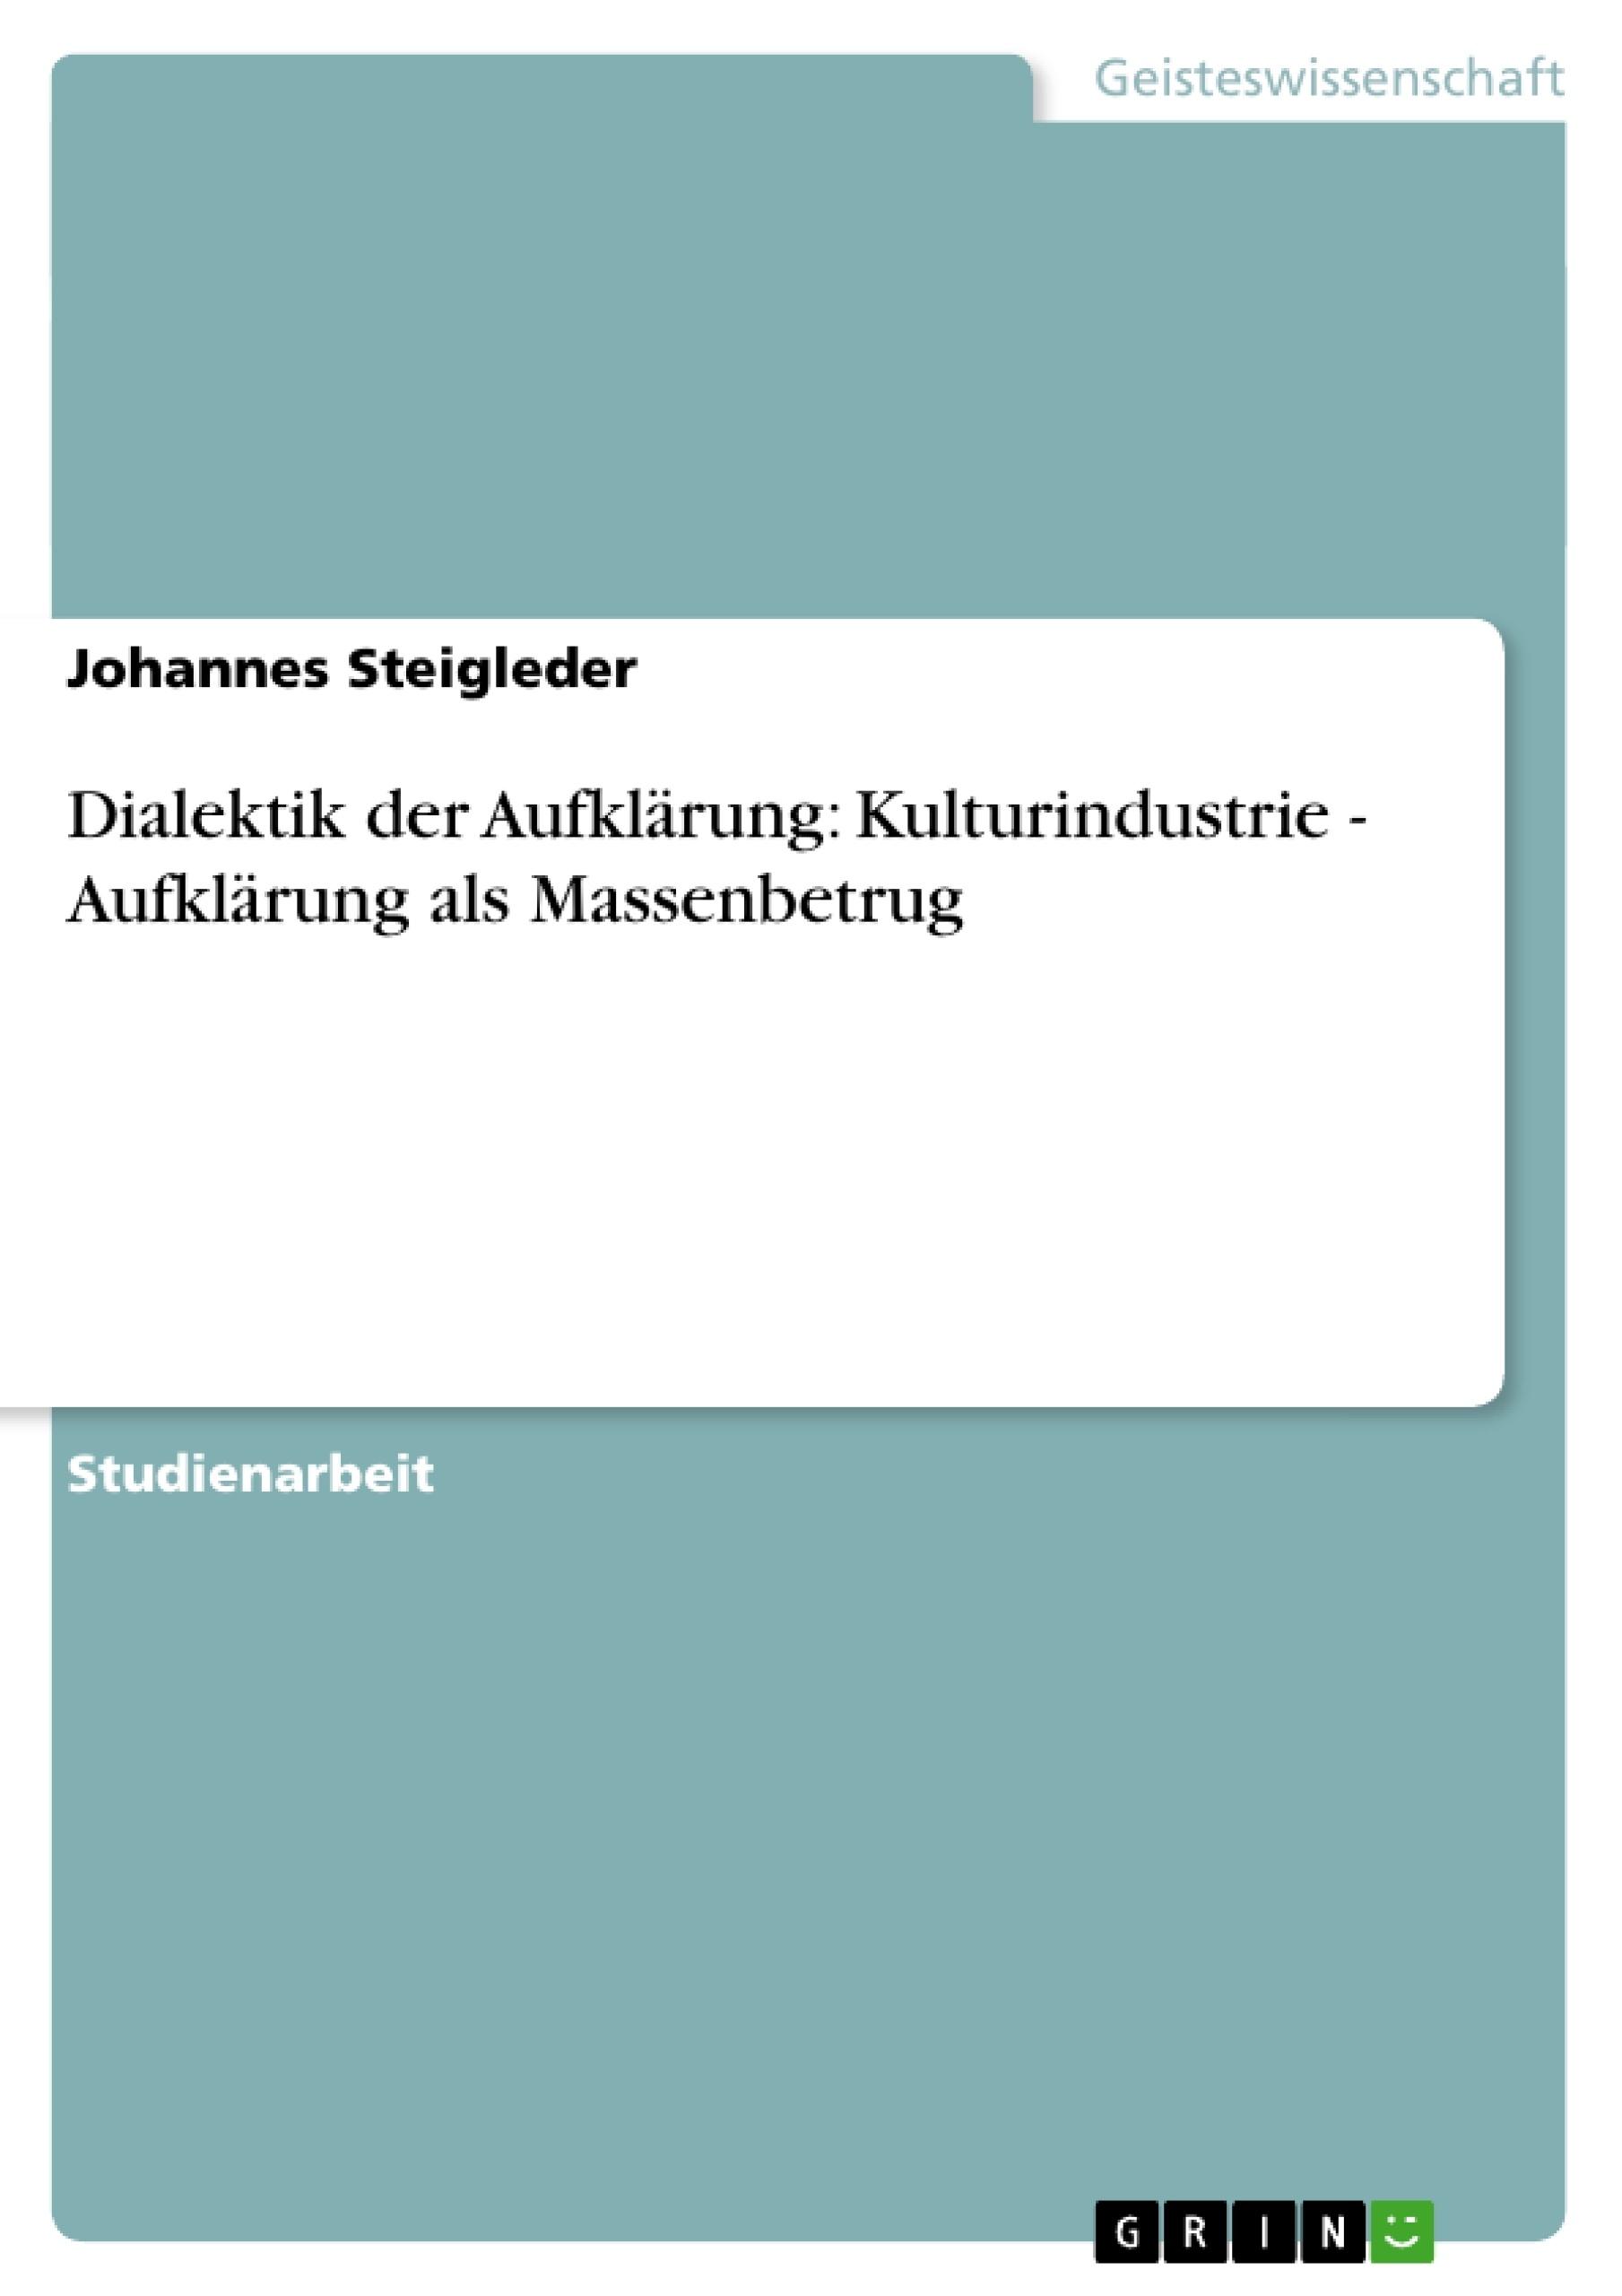 Titel: Dialektik der Aufklärung: Kulturindustrie - Aufklärung als Massenbetrug